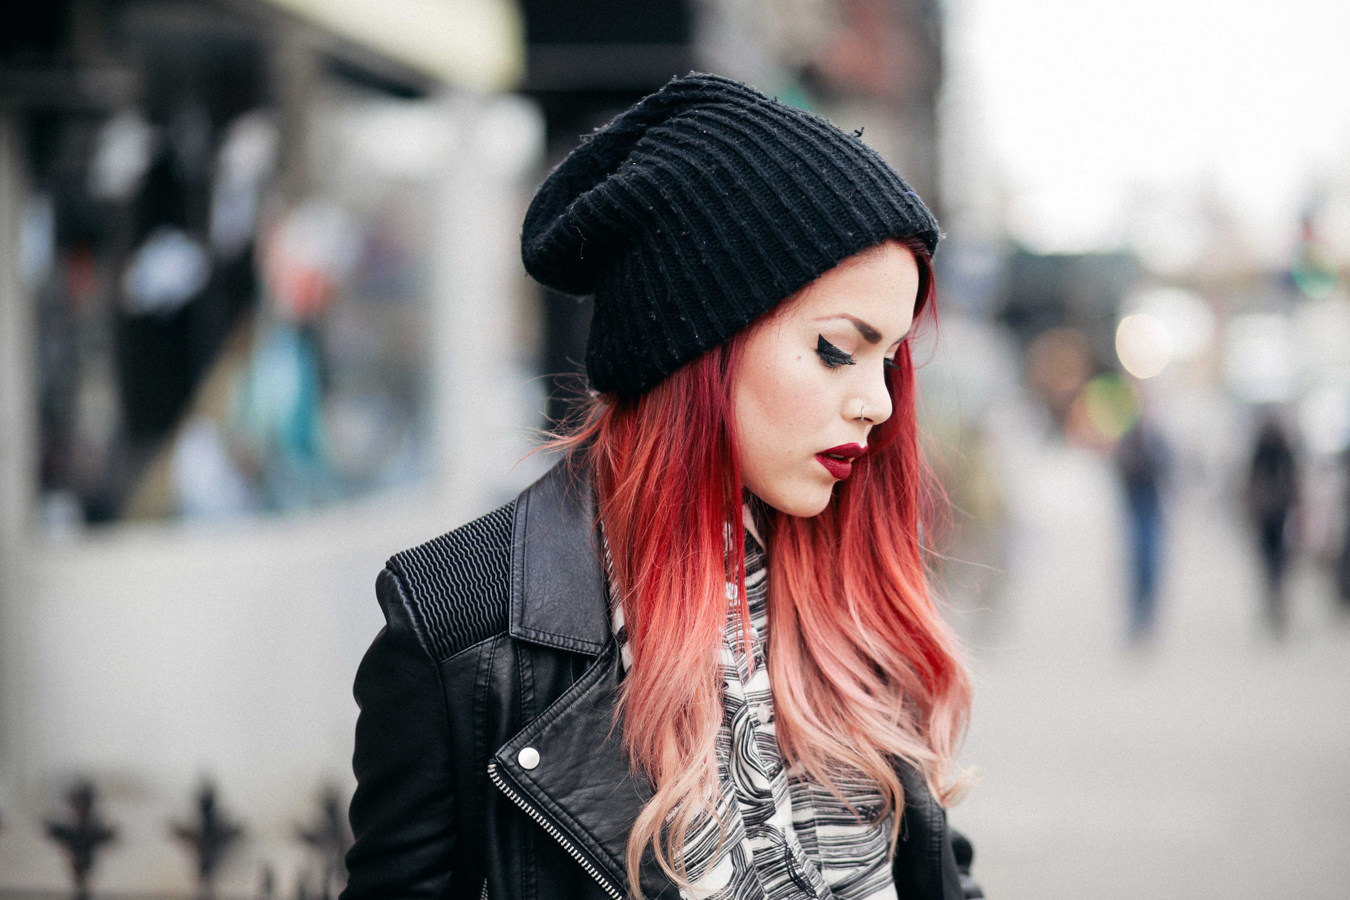 Le Happy wearing beanie and biker jacket